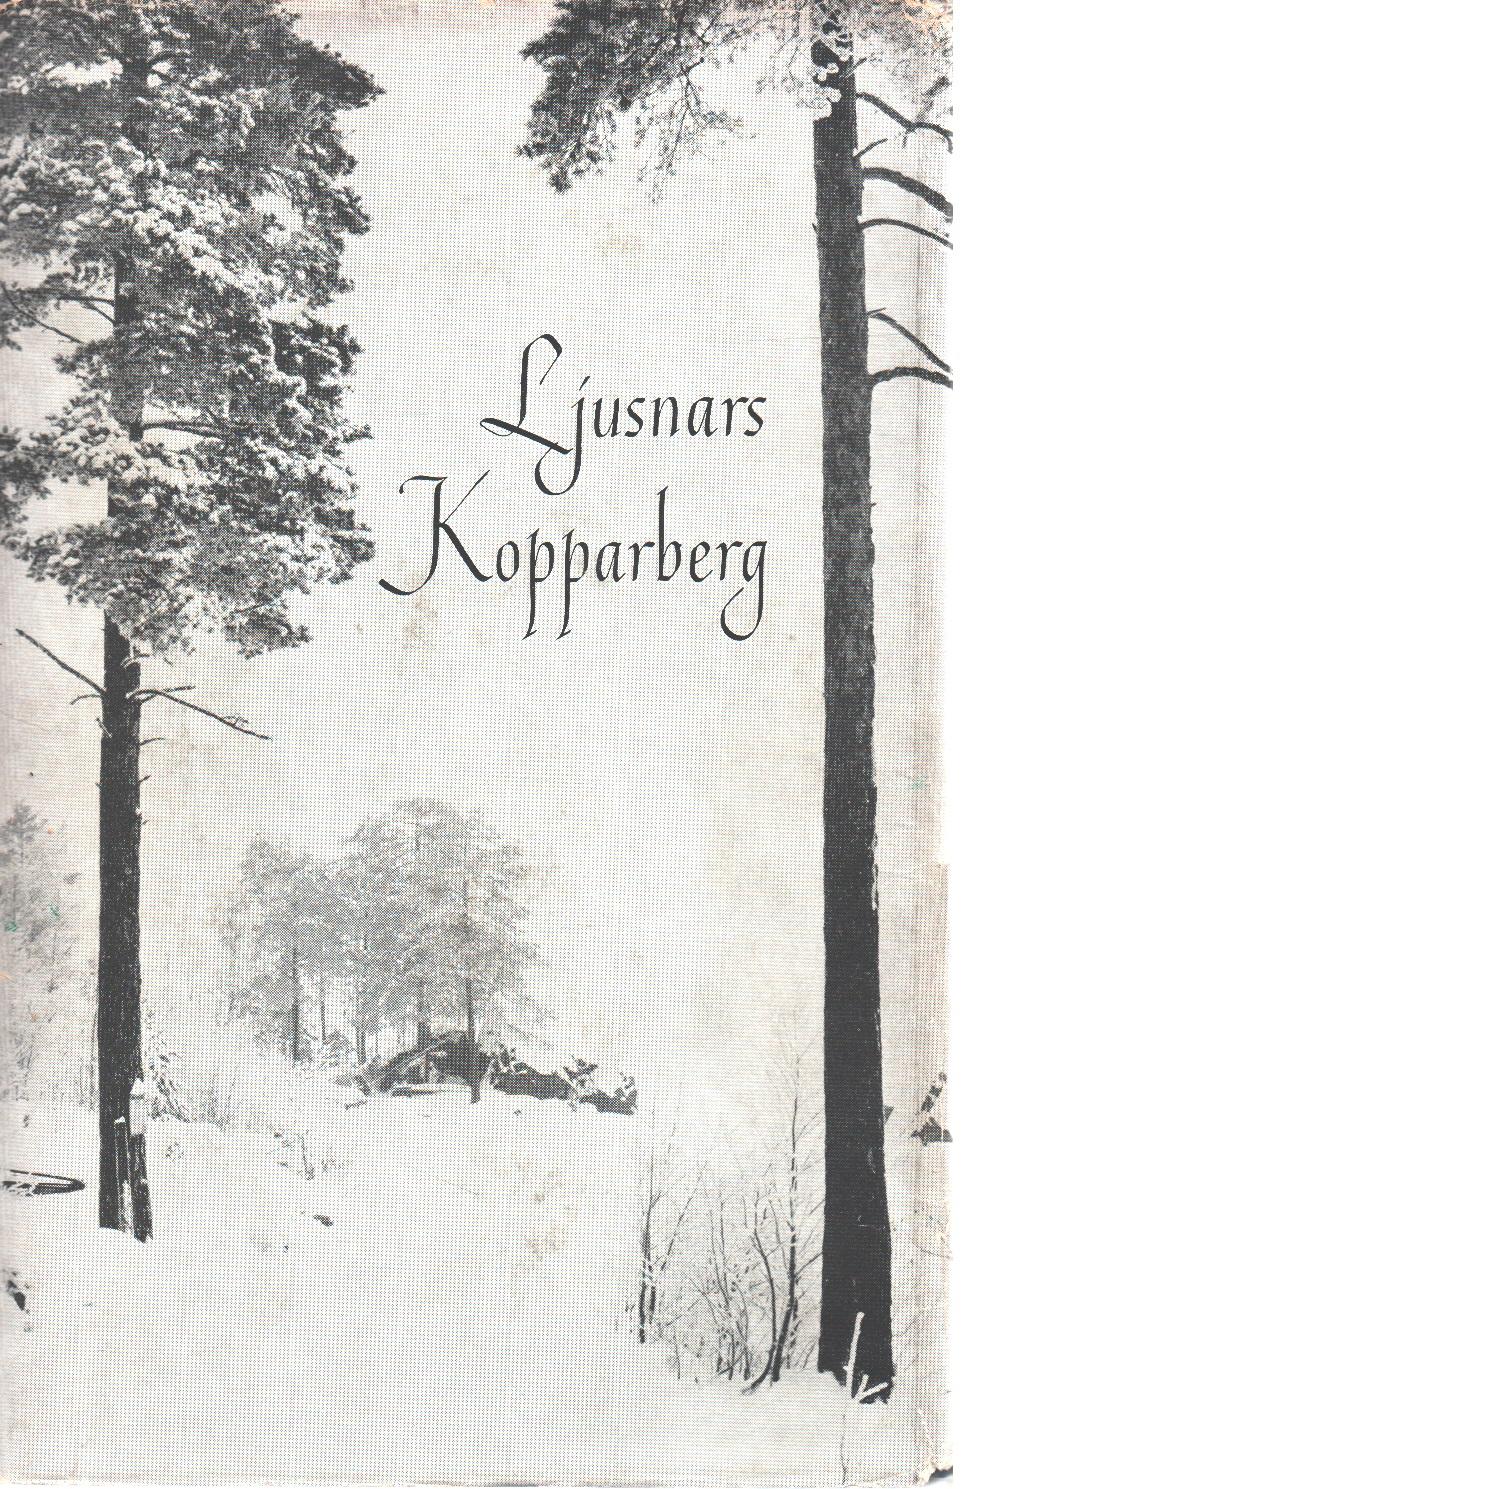 Ljusnars-kopparberg en hembygdsbok - Red.